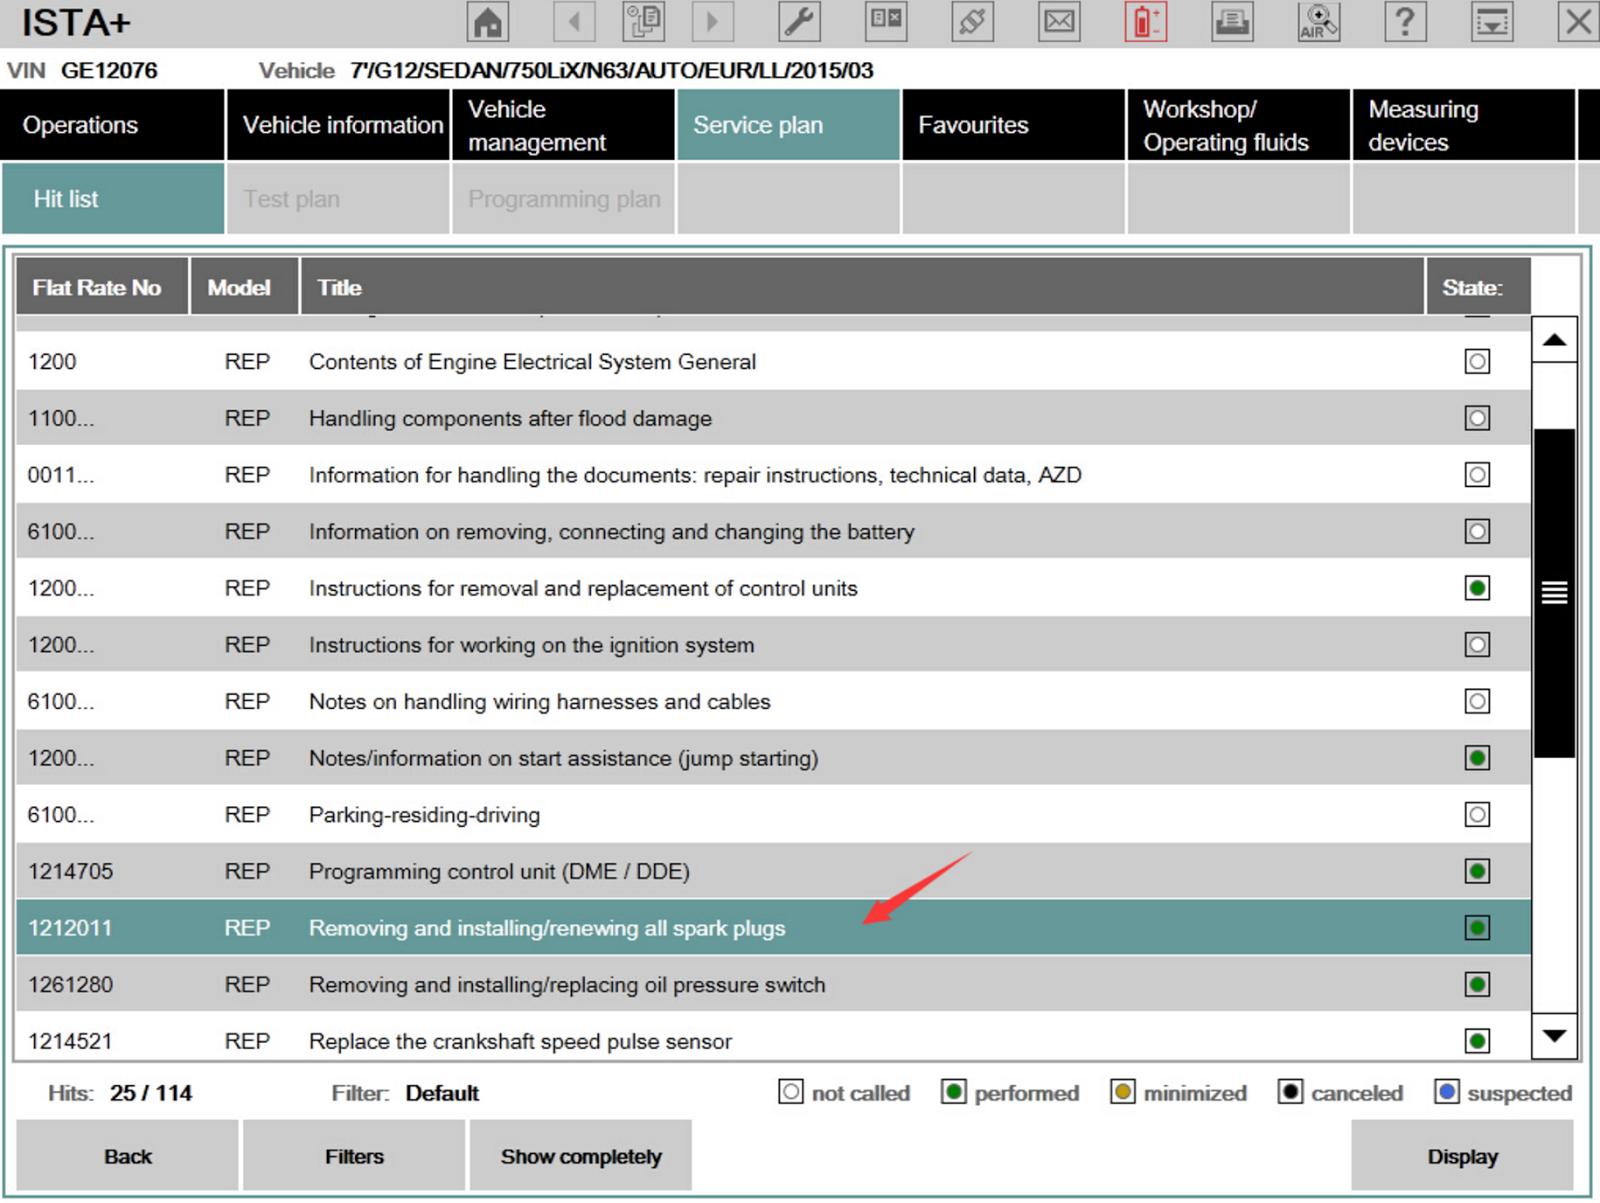 2019 Bmw Diagnostic Software Ediabas Inpa Ncs Expert Dis Ista Download Wds Java Wiring Diagram Diagnose